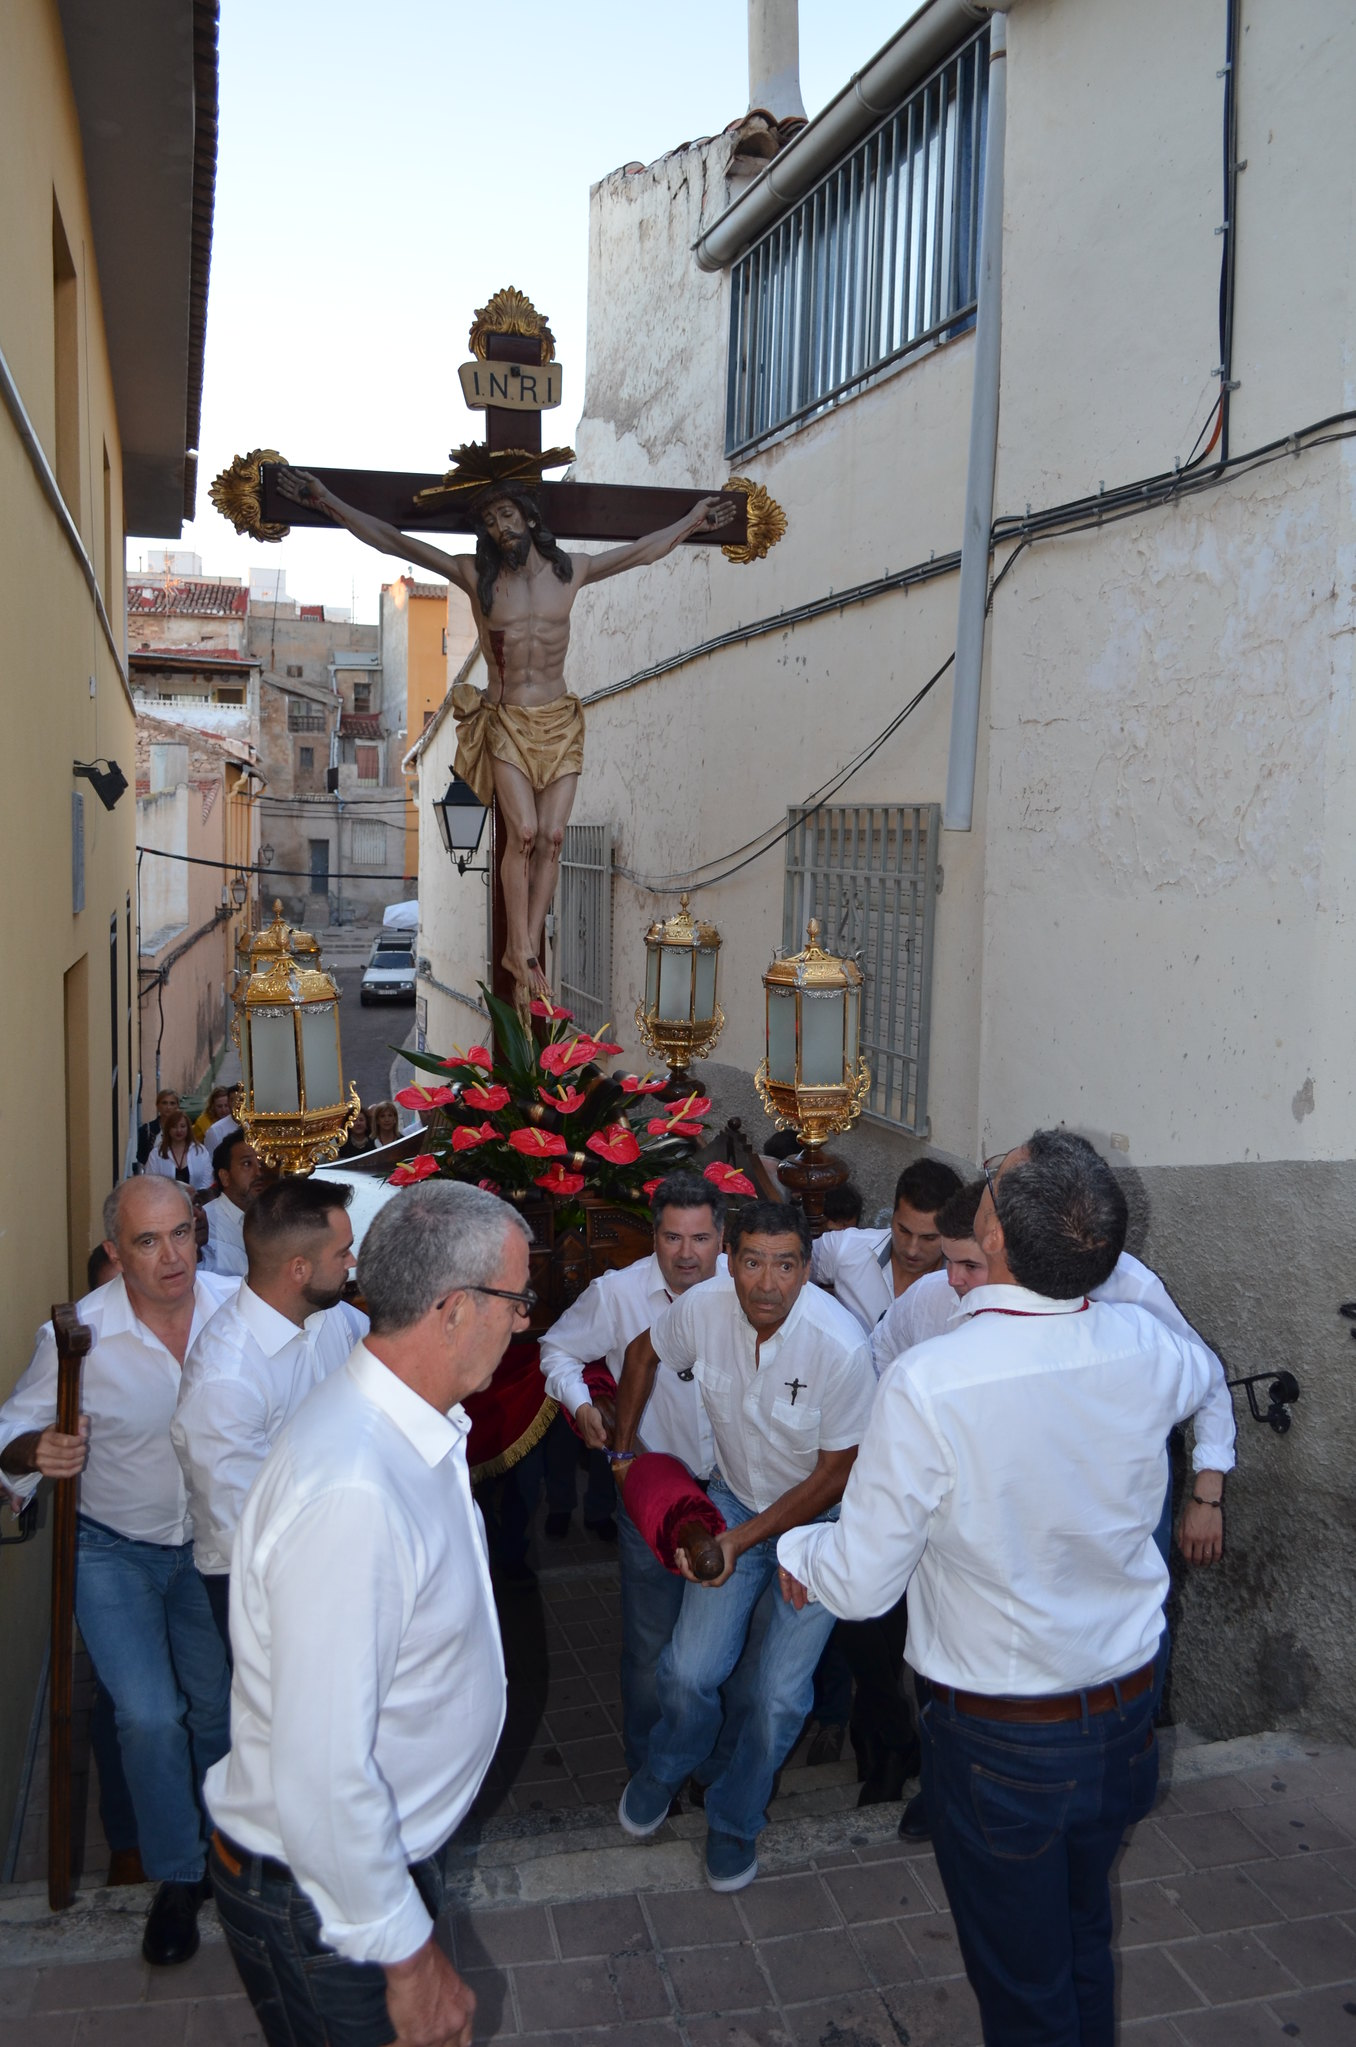 (2017-07-02) Procesión de subida - Pere Sánchez Falco (05)